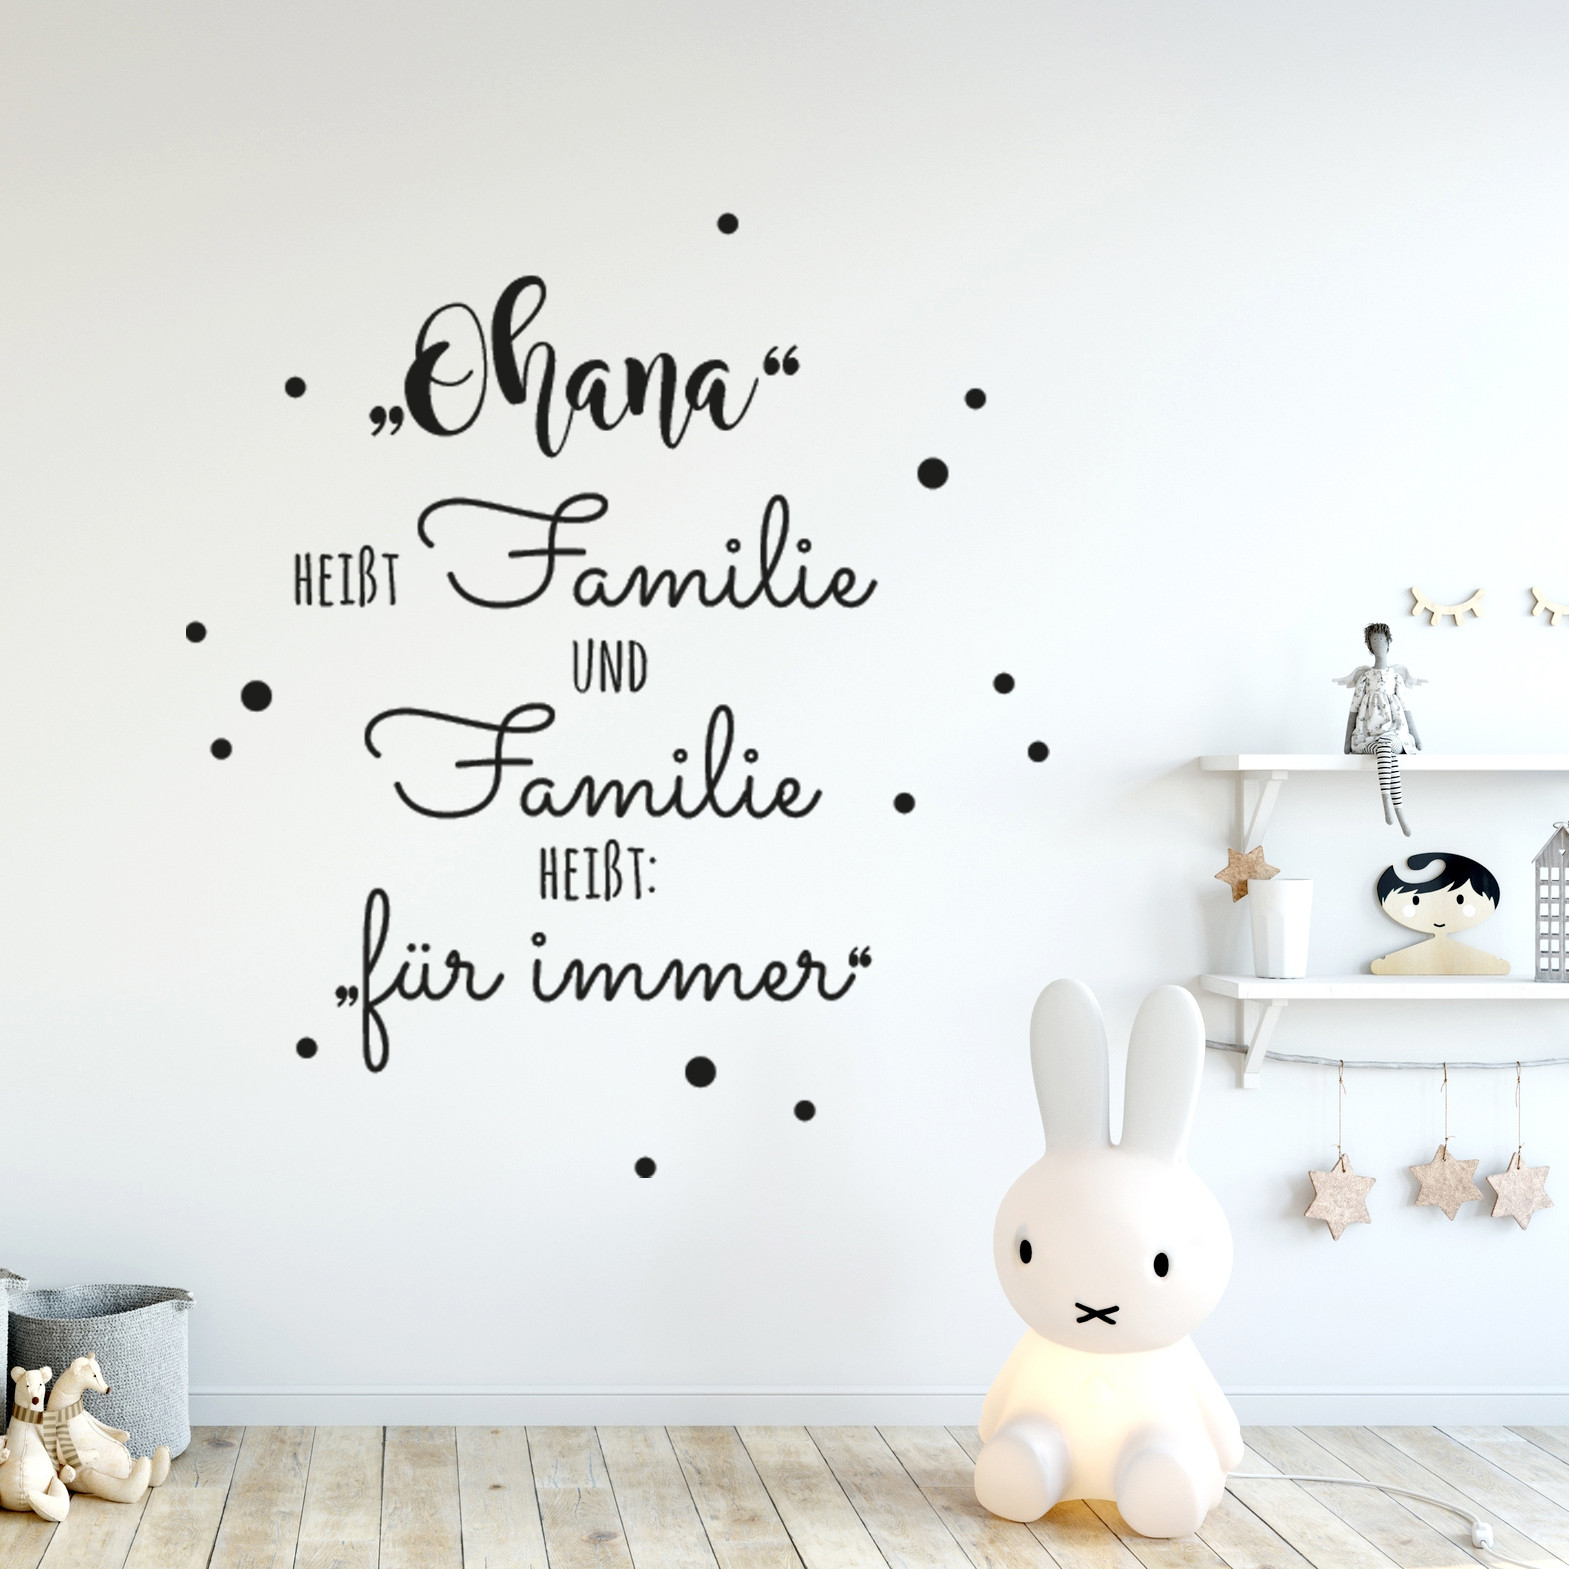 wandtattoo familie aufkleber zitat spruch ohana hei t familie mit punkte wanddeko. Black Bedroom Furniture Sets. Home Design Ideas